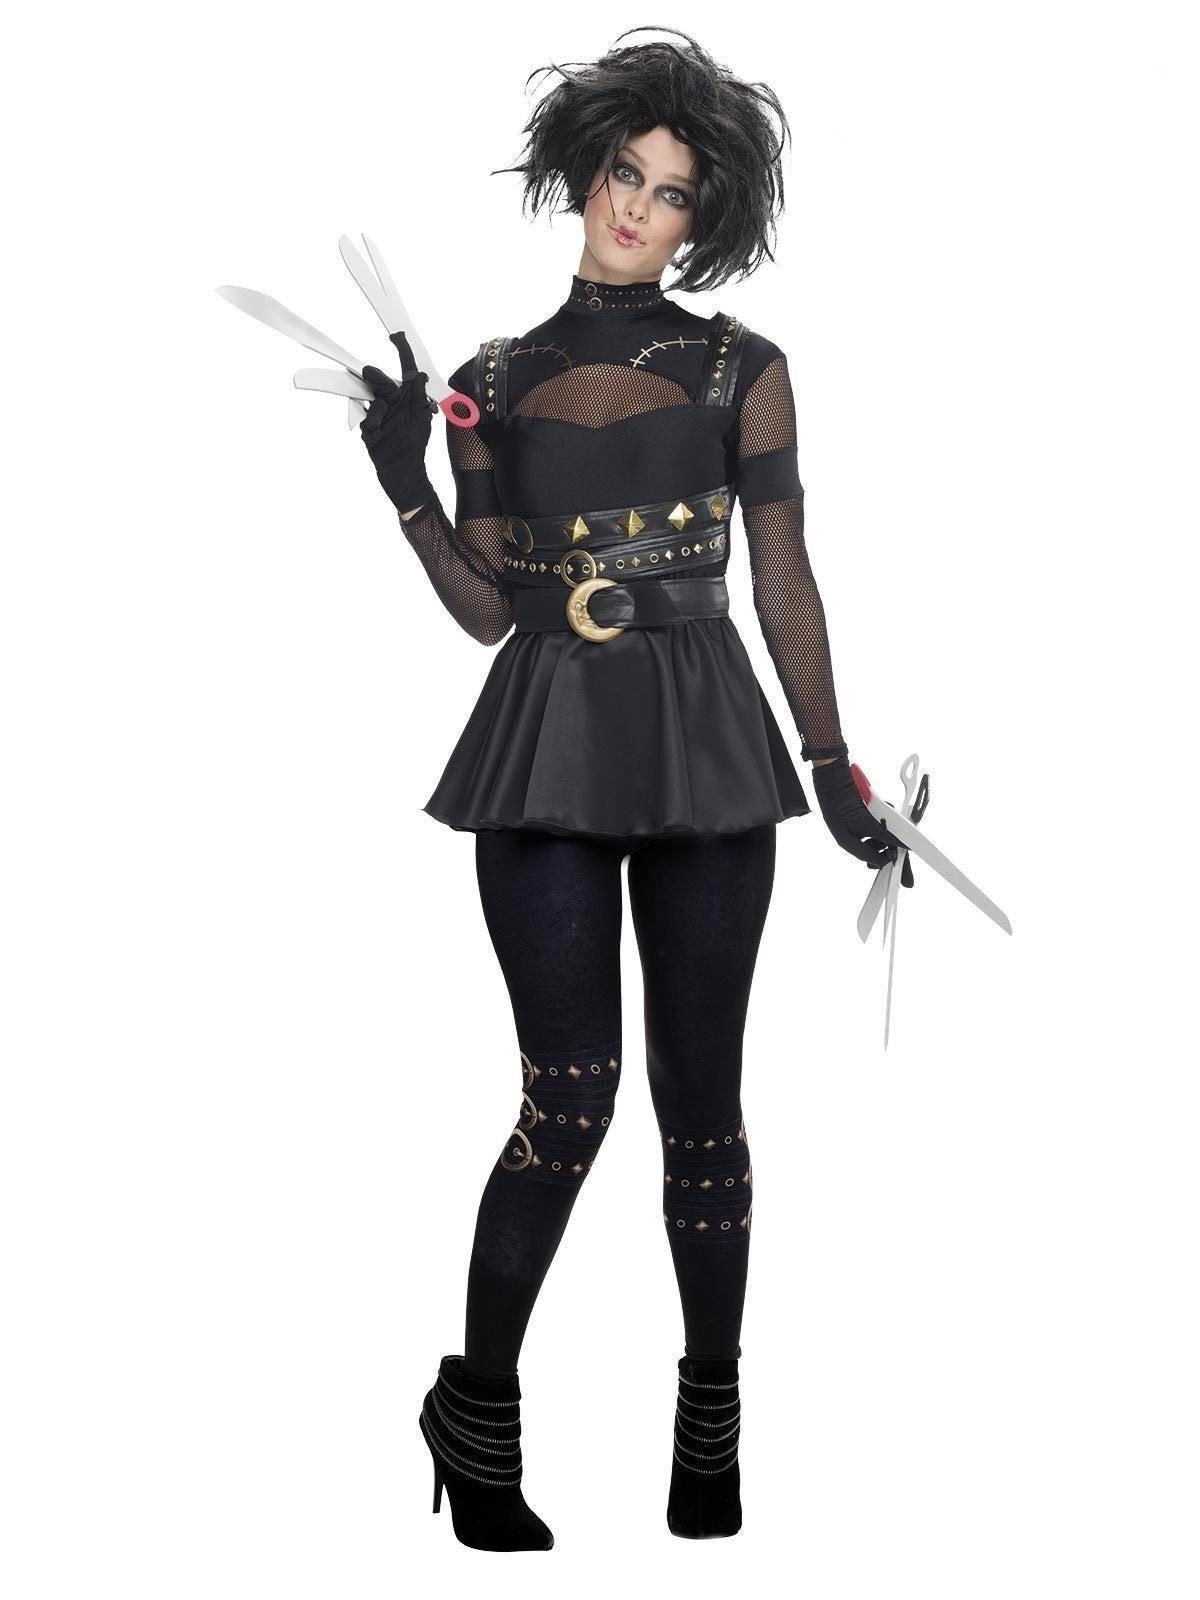 Edward Scissorhands Sexy Deluxe Costume for Adults - Edward Scissorhands